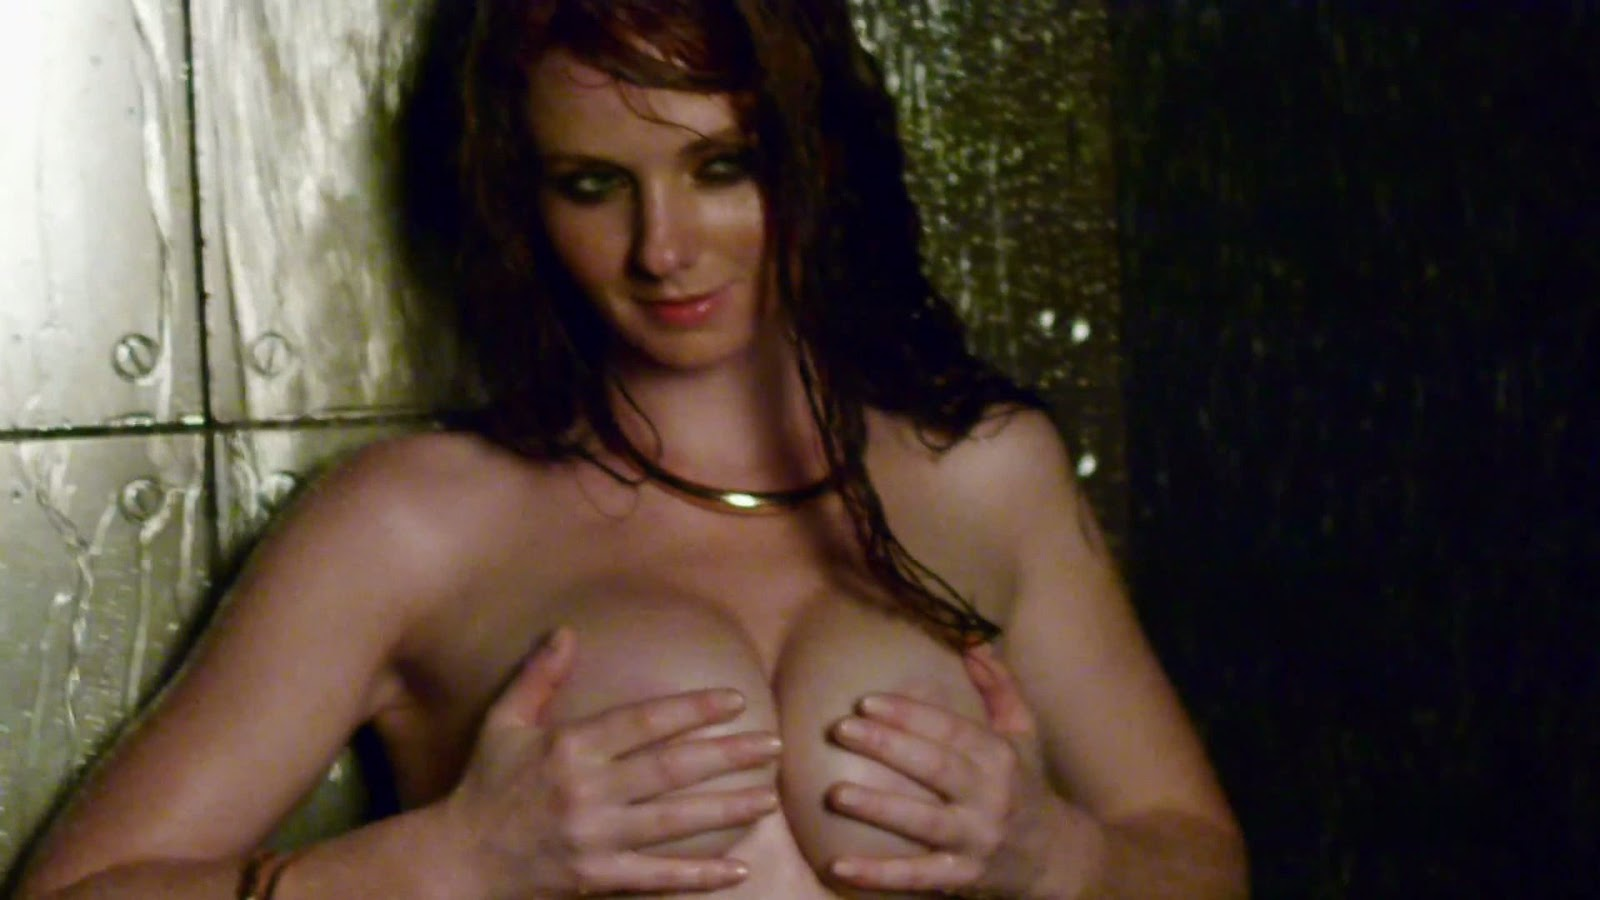 Lena katina sex tape